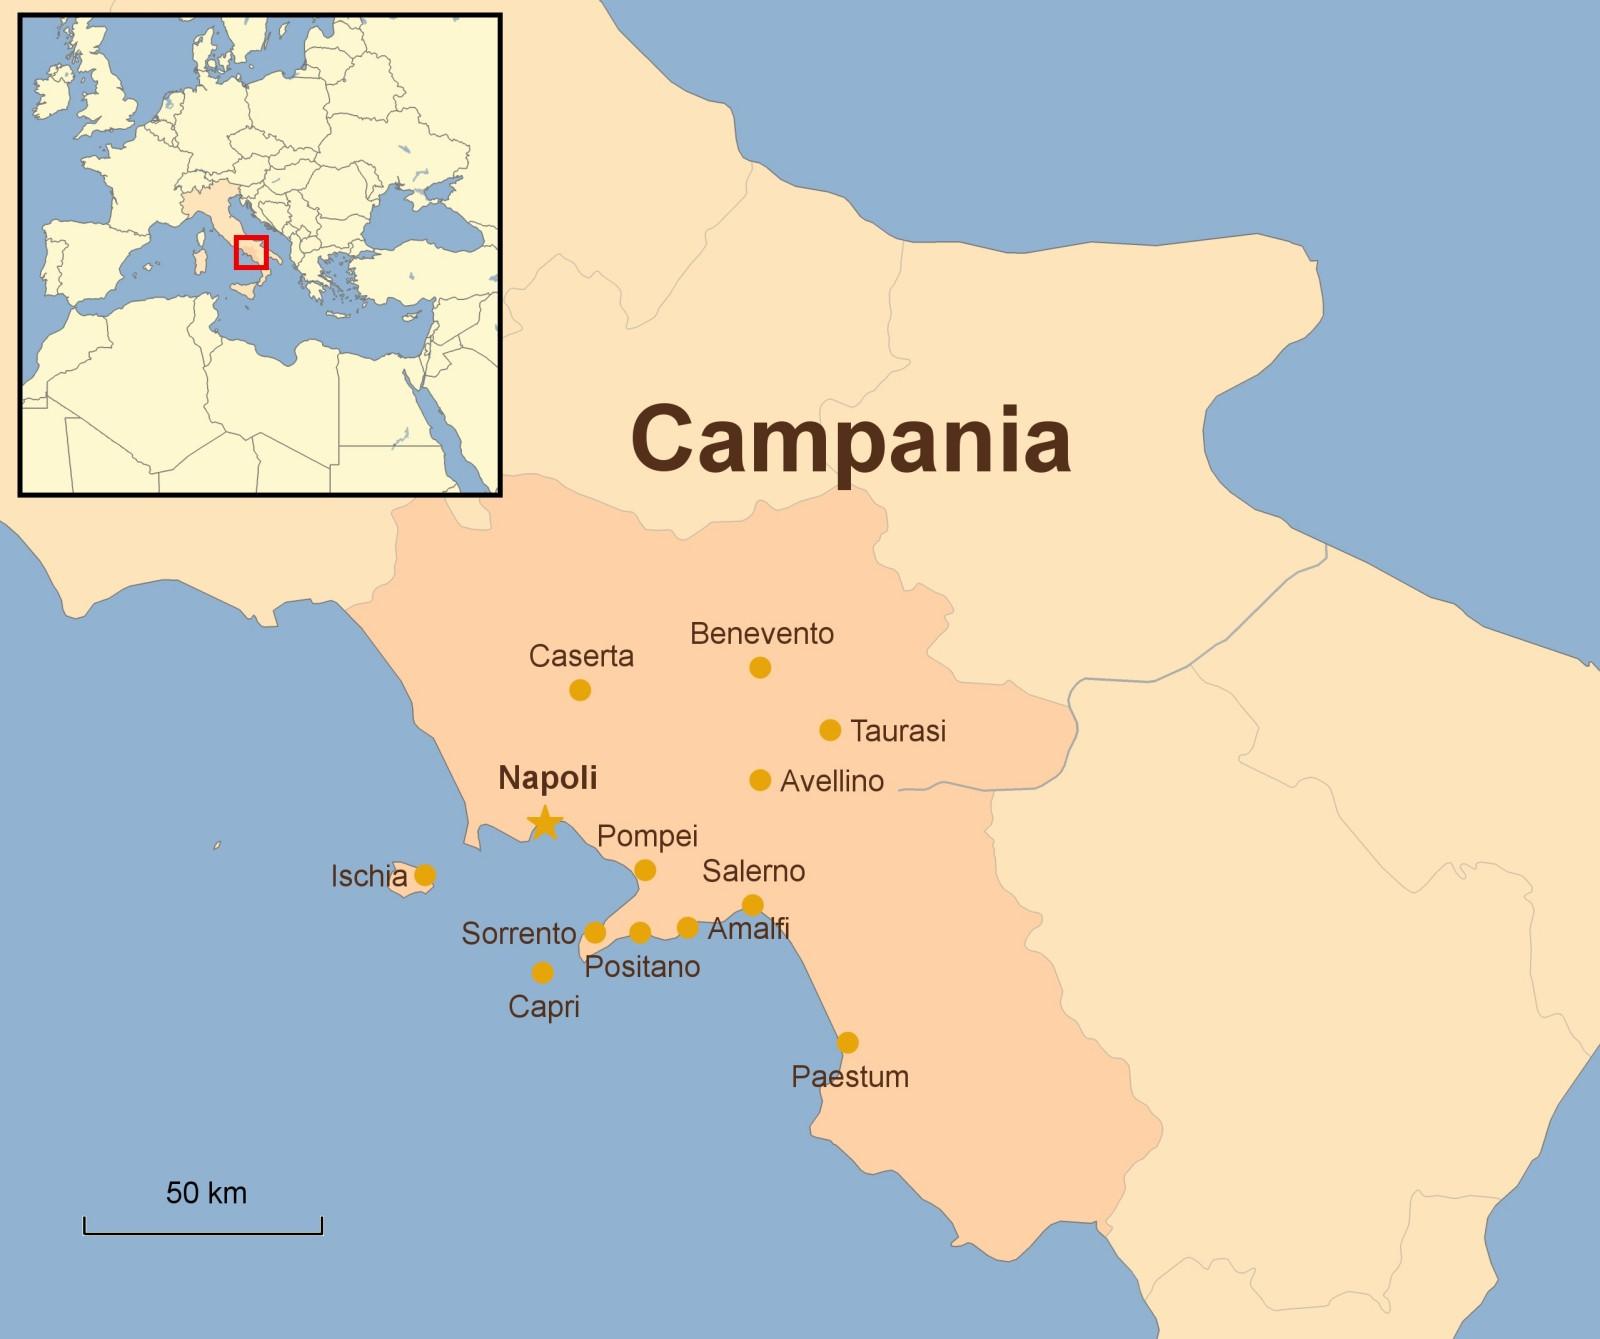 Pruvodce Po Regionu Kampanie Italie Mahalo Cz